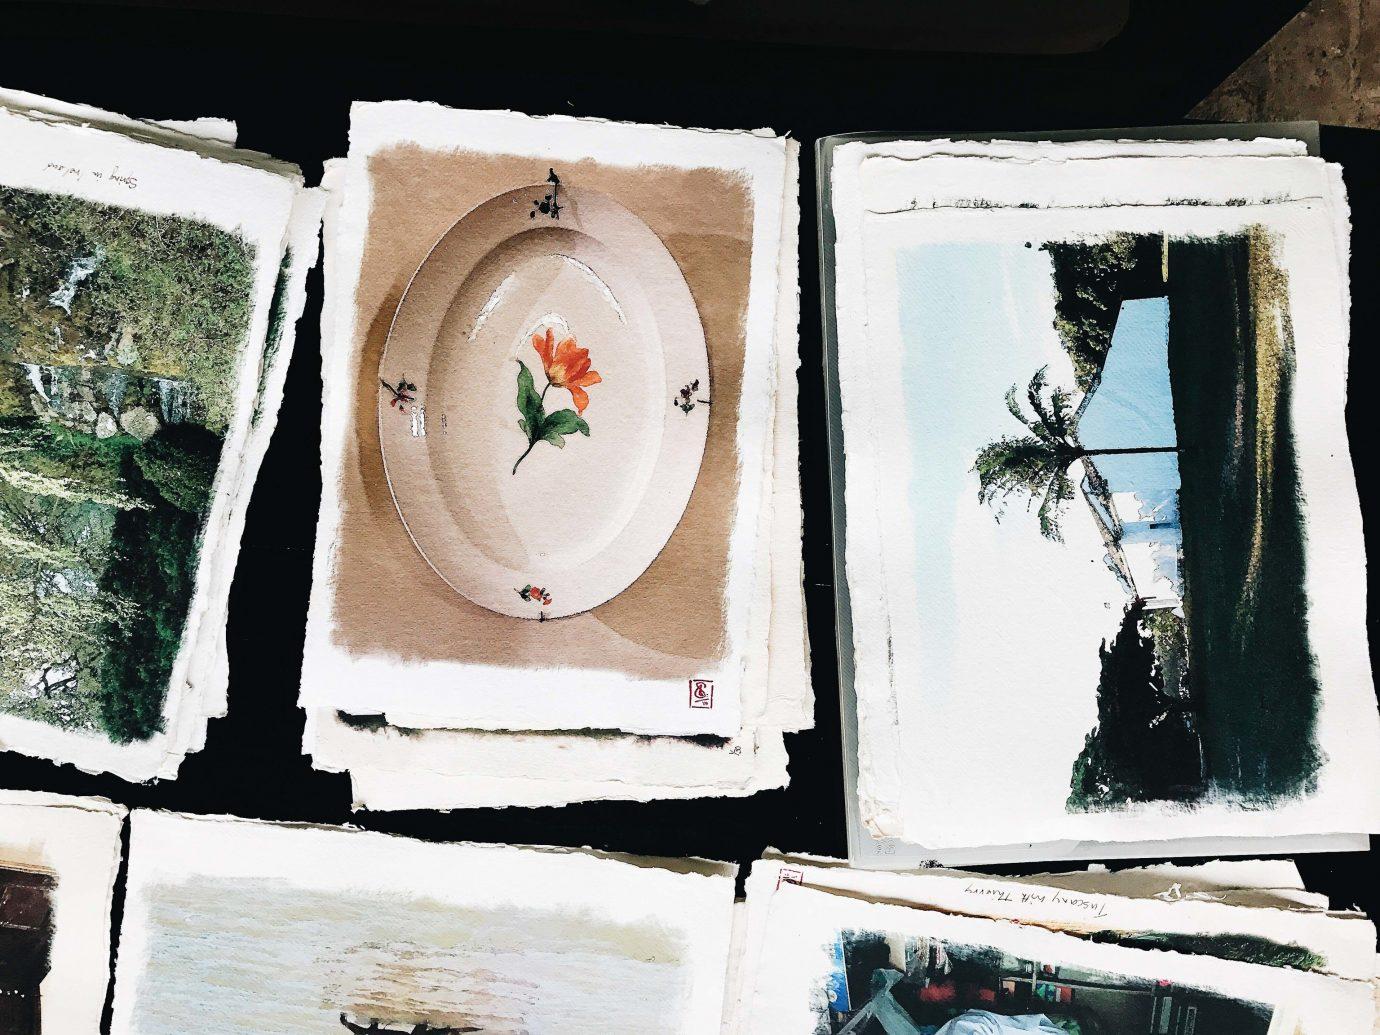 Beach Romantic Getaways south america Trip Ideas Uruguay dish sushi food art painting paint artwork